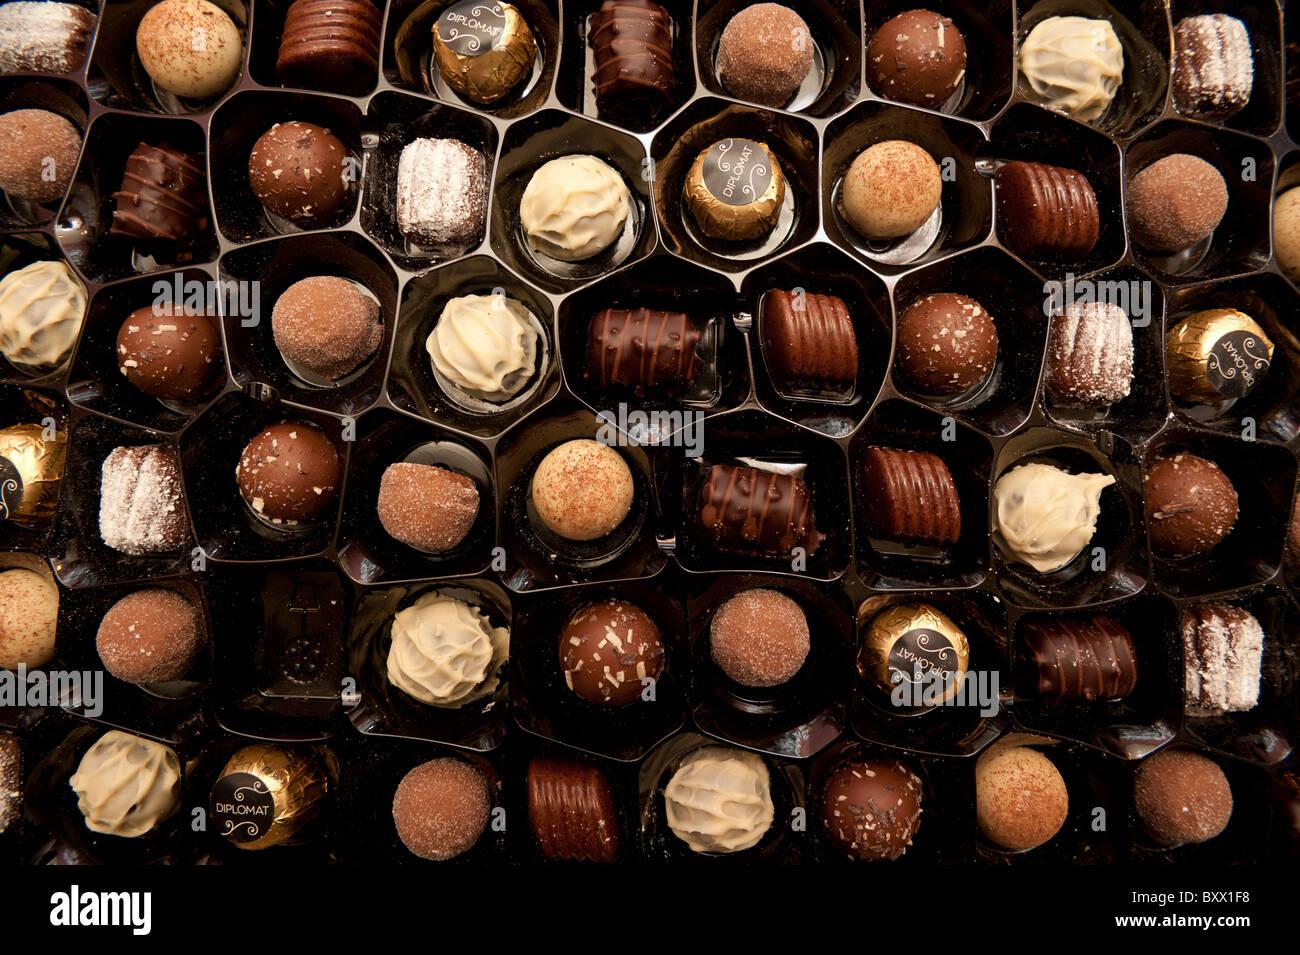 A tray of Thornton's luxury chocolates and truffles, UK - Stock Image